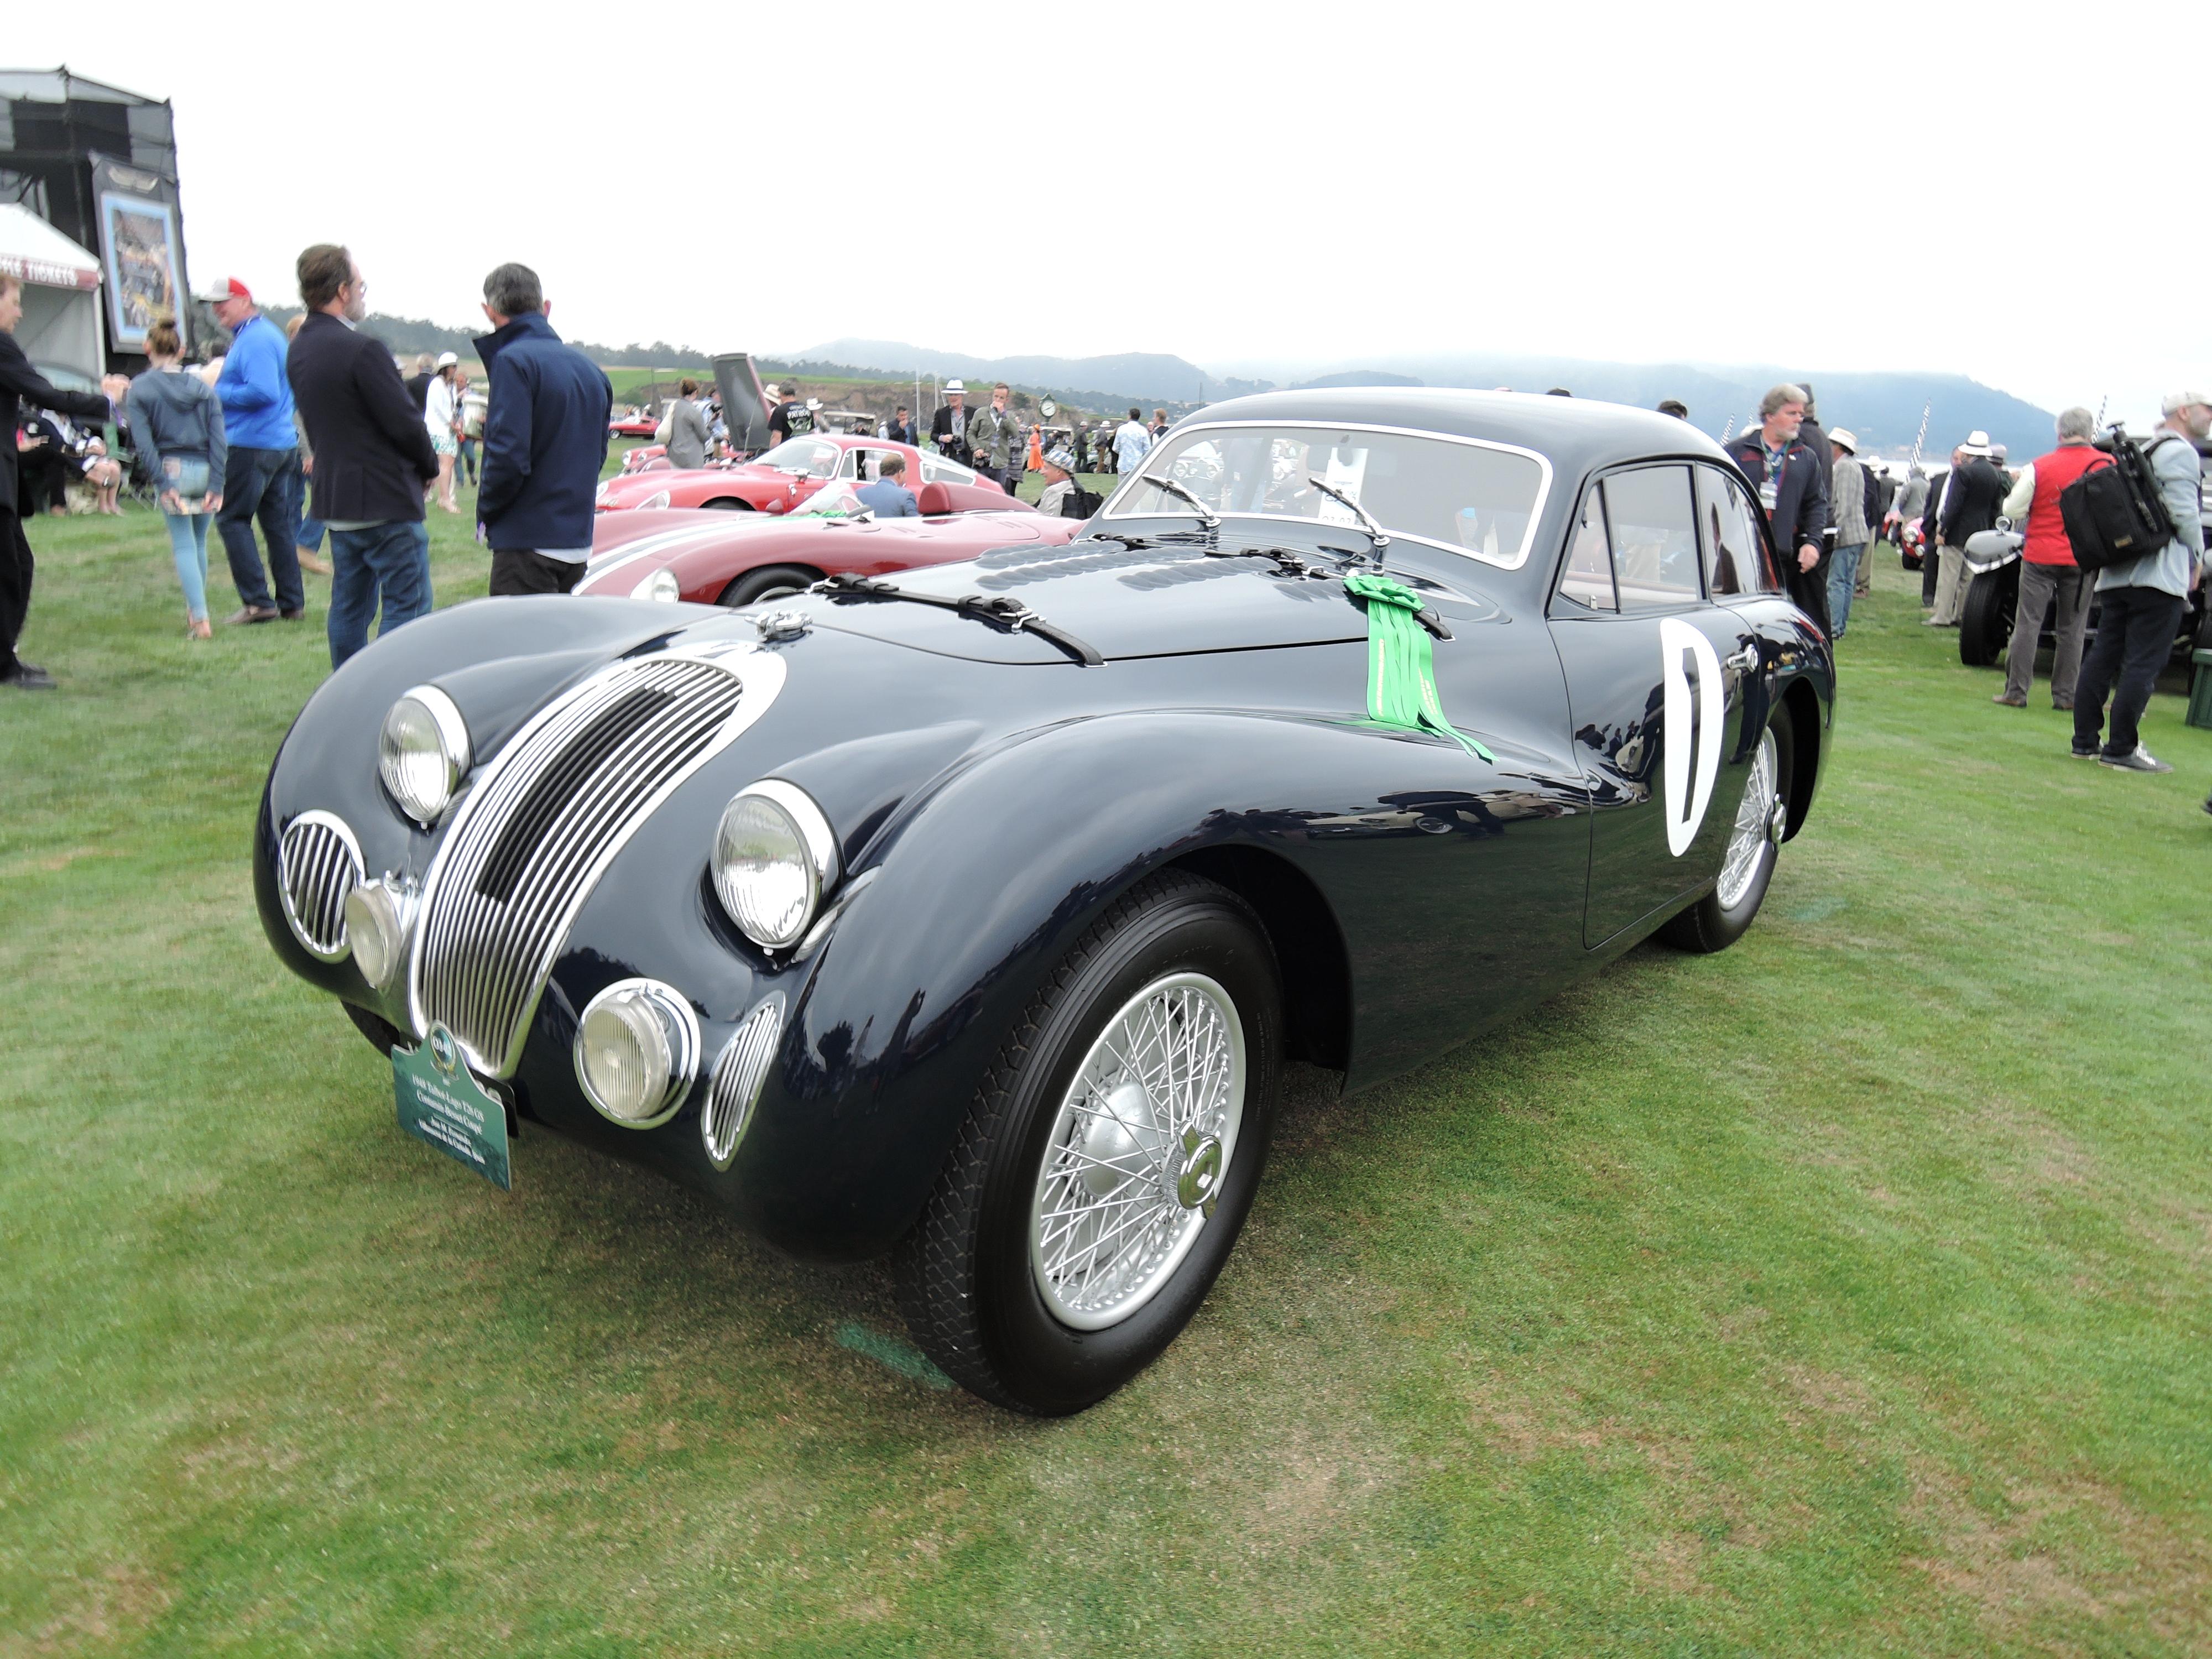 black 1948 Talbot-Lago T26 GS Contamin-Besset Coupe - Pebble Beach Concours d'Elegance 2017